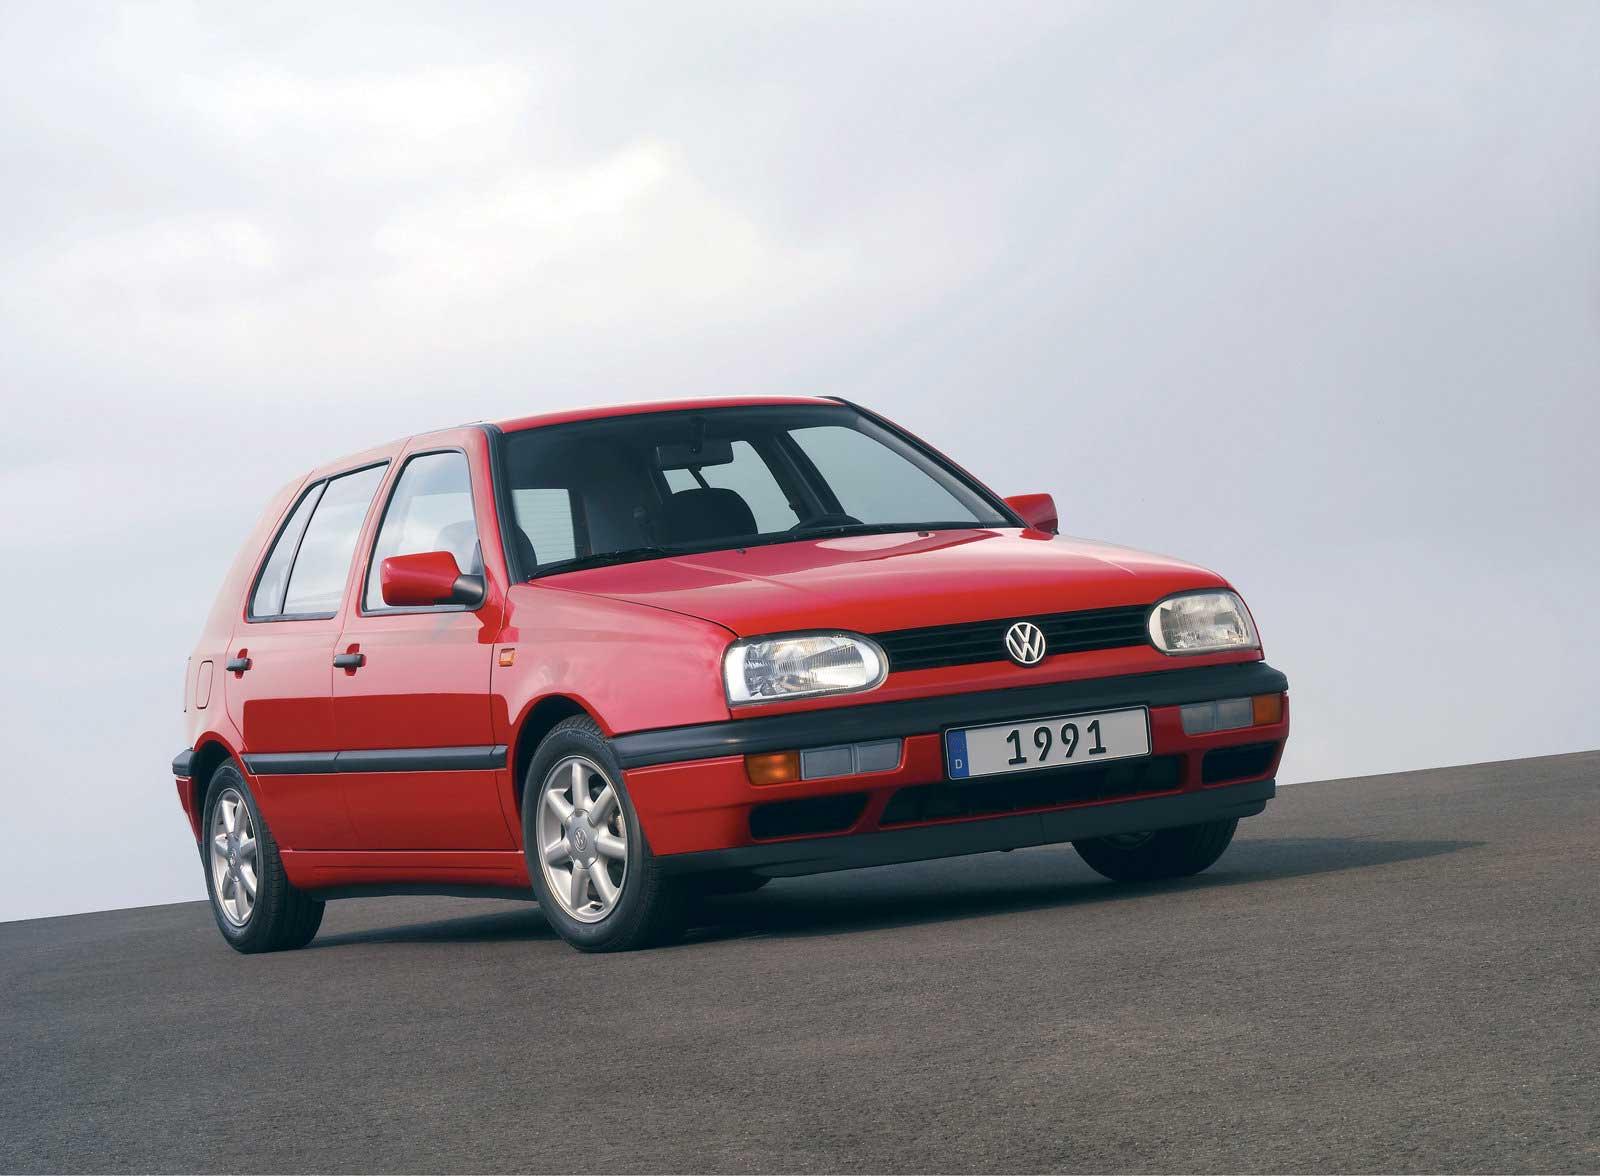 VW Golf 3 (1991-1997)